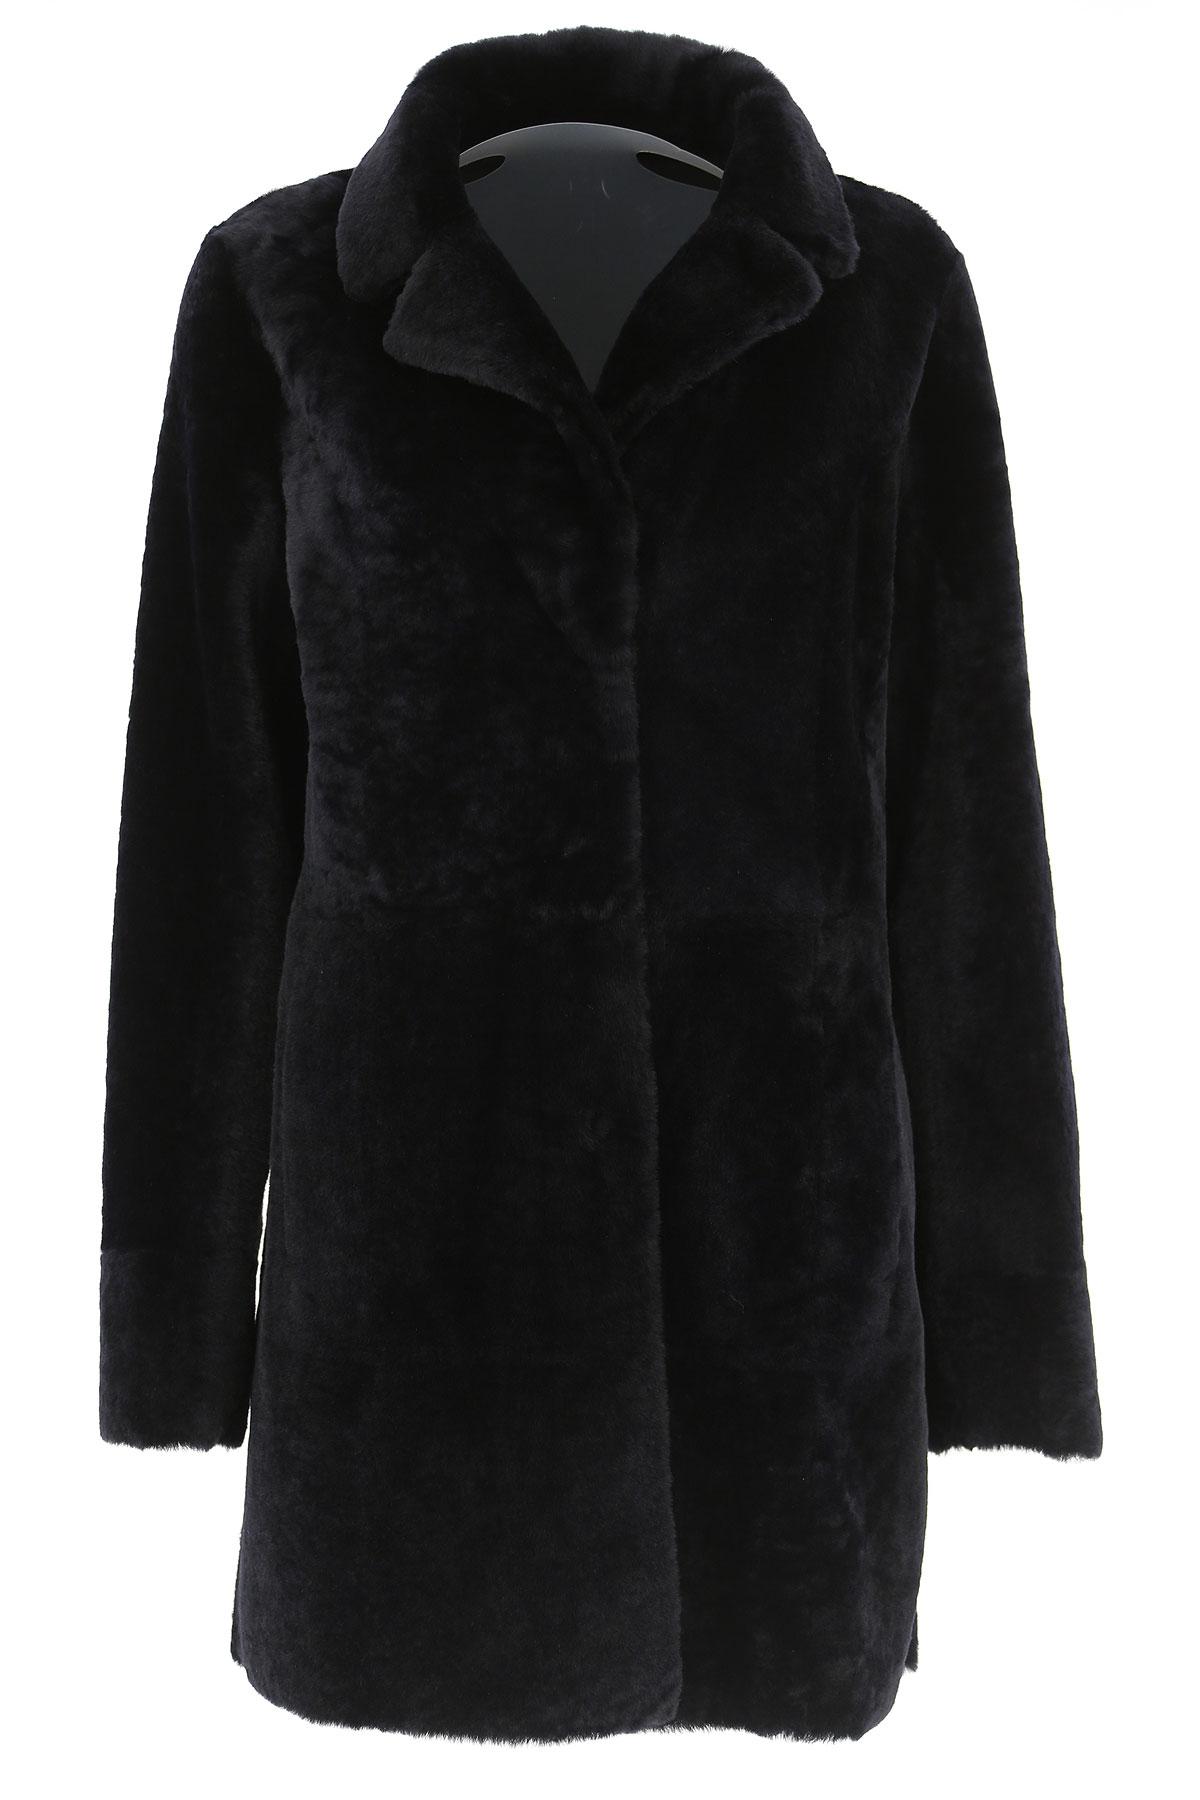 Image of Drome Women\'s Coat, Black, Fur, 2017, 4 6 8